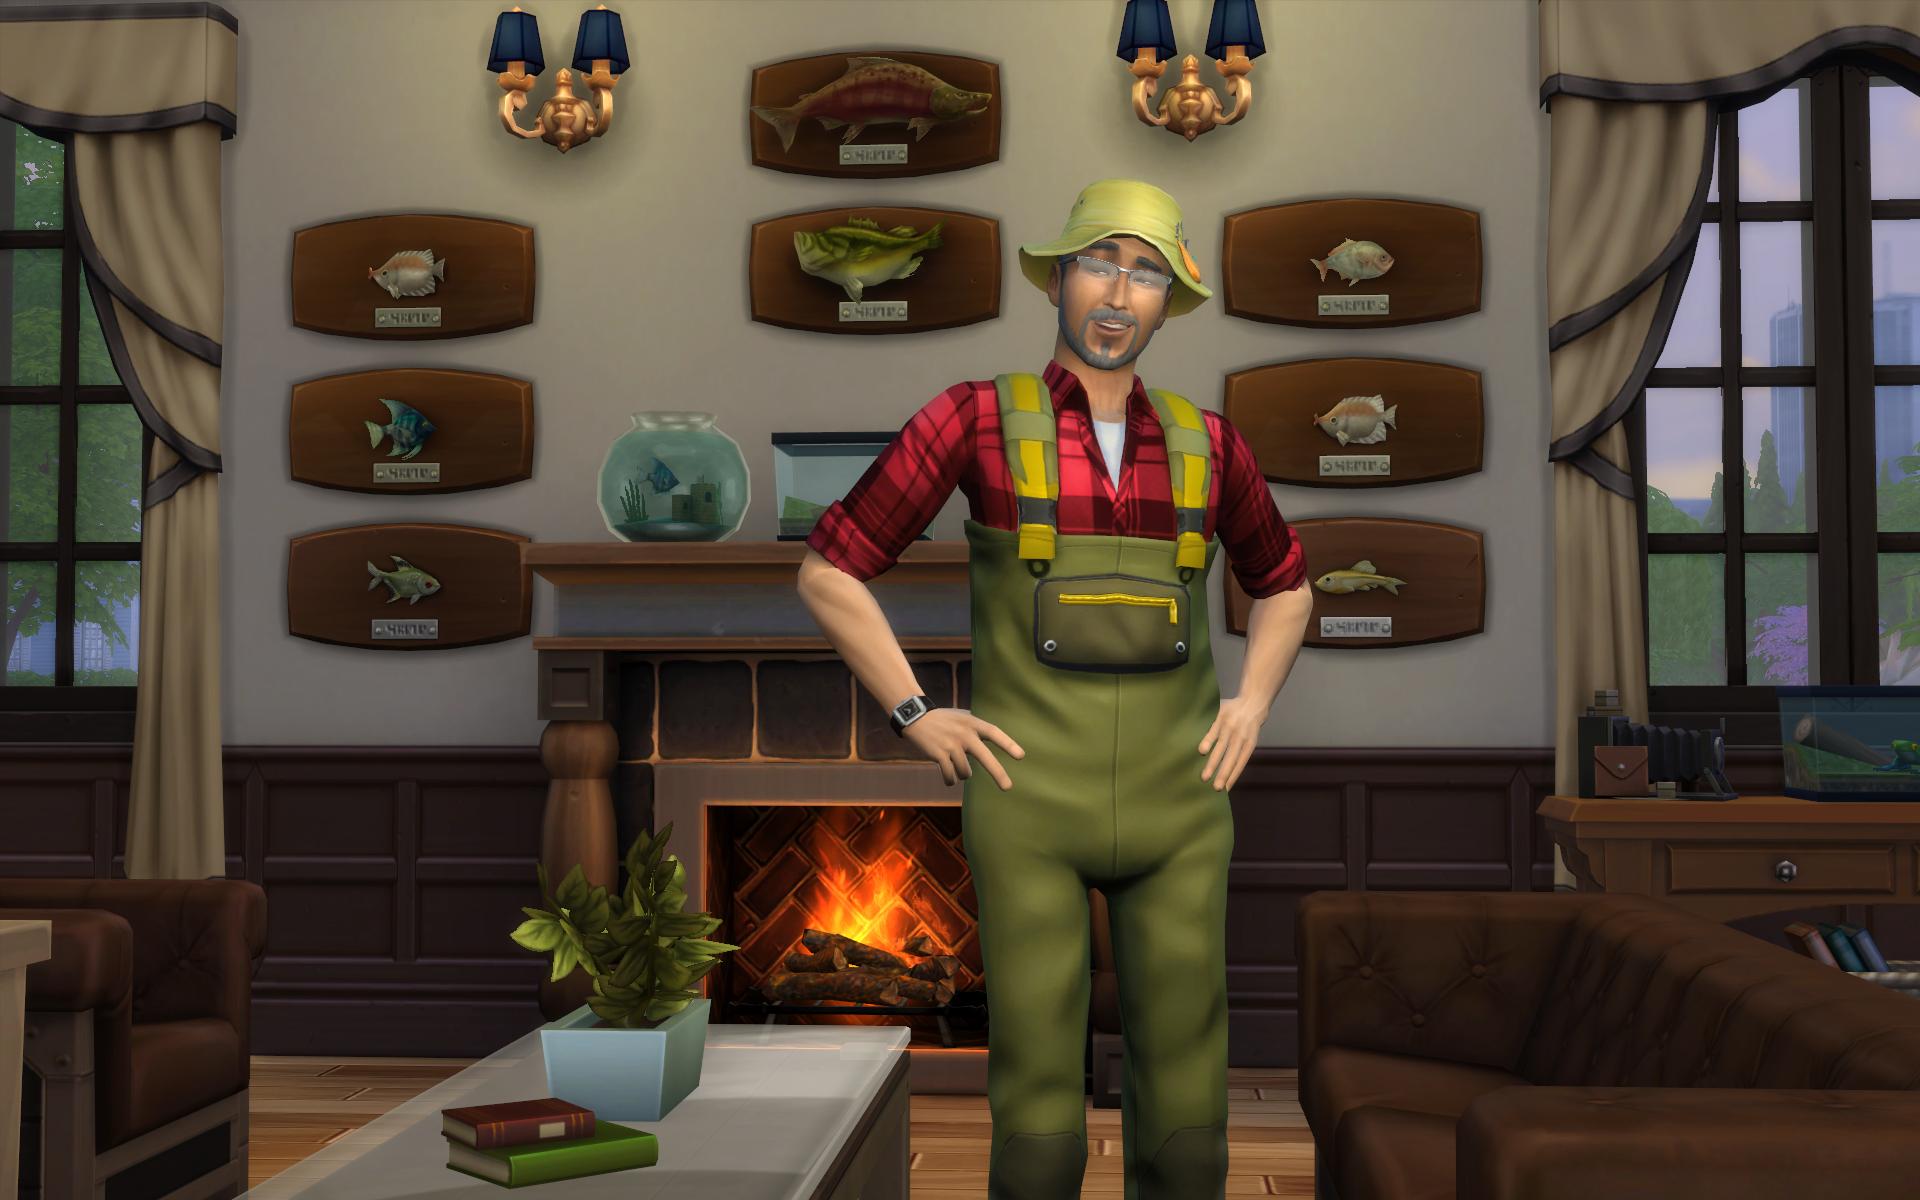 [Noticia]Reportajes de Los Sims 4: Pekesims 14633565169_55cdefc5b9_o